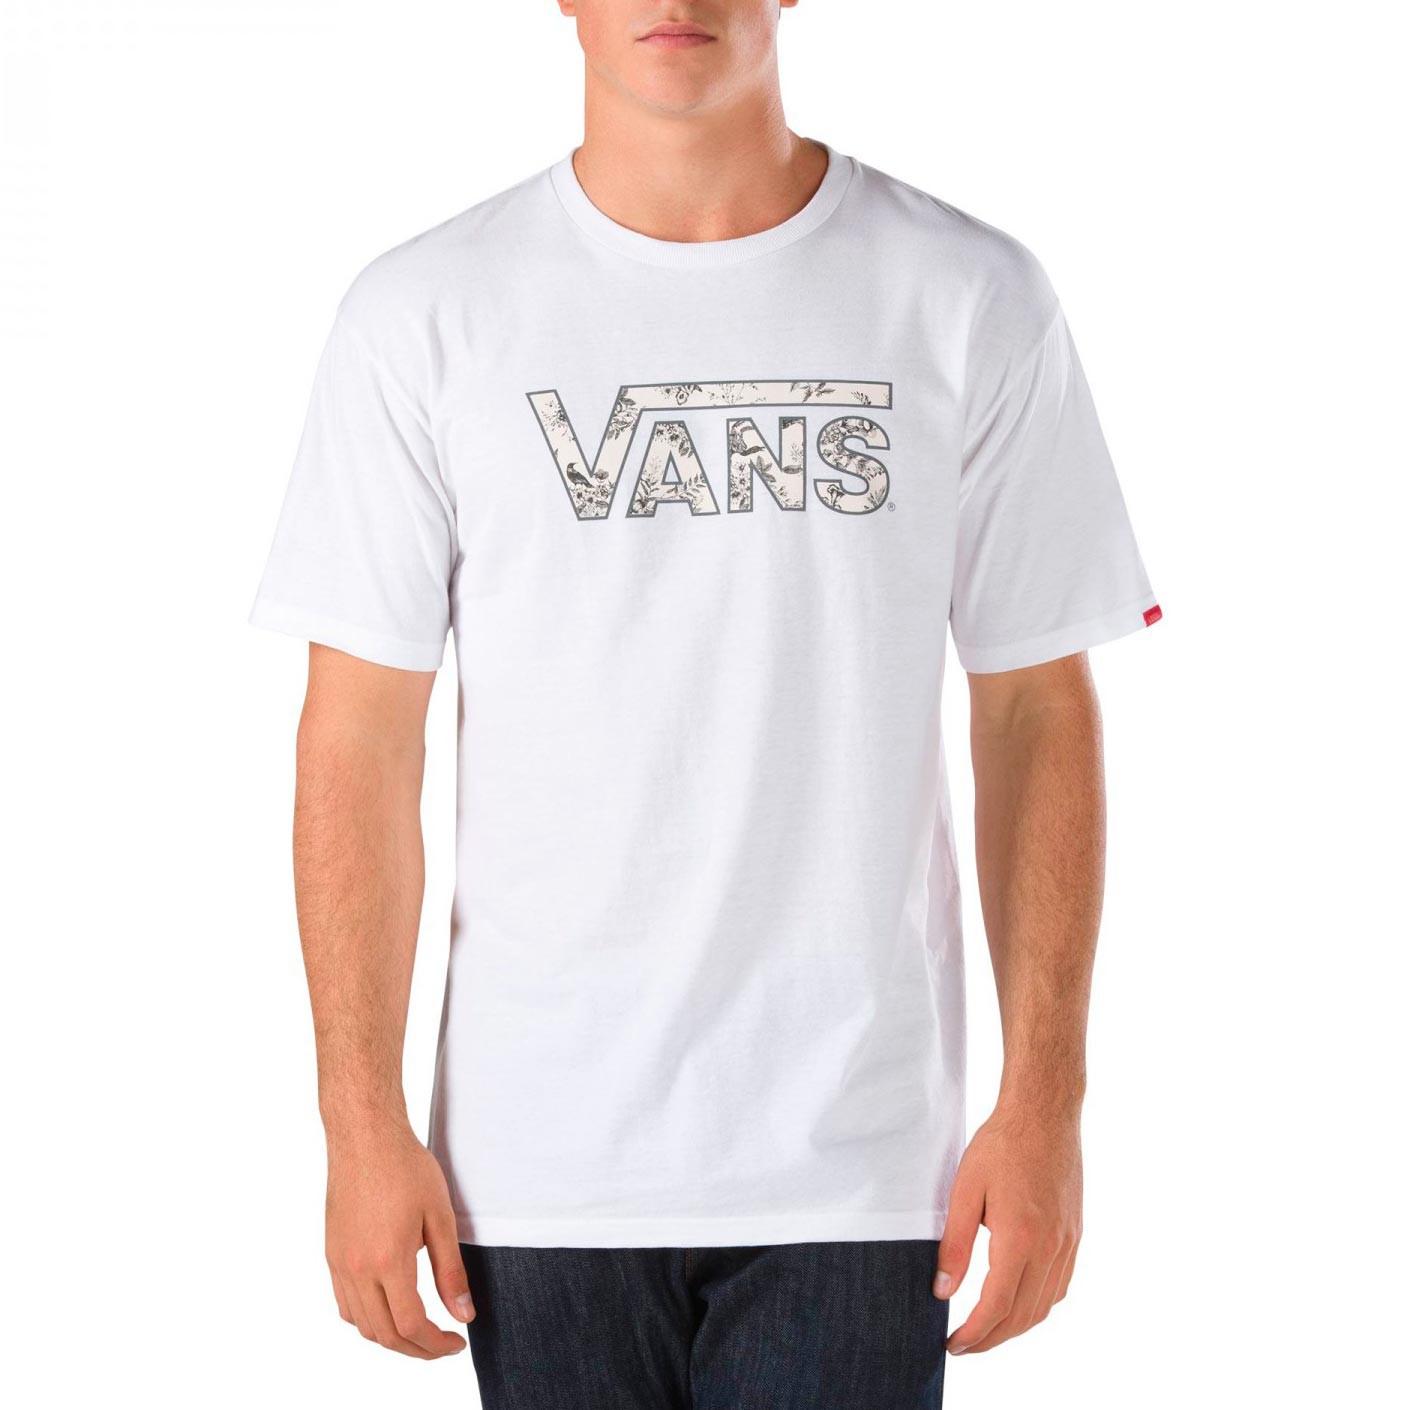 Tričko Vans Classic Logo white/datura toile vel.L 16 + doručení do 24 hodin